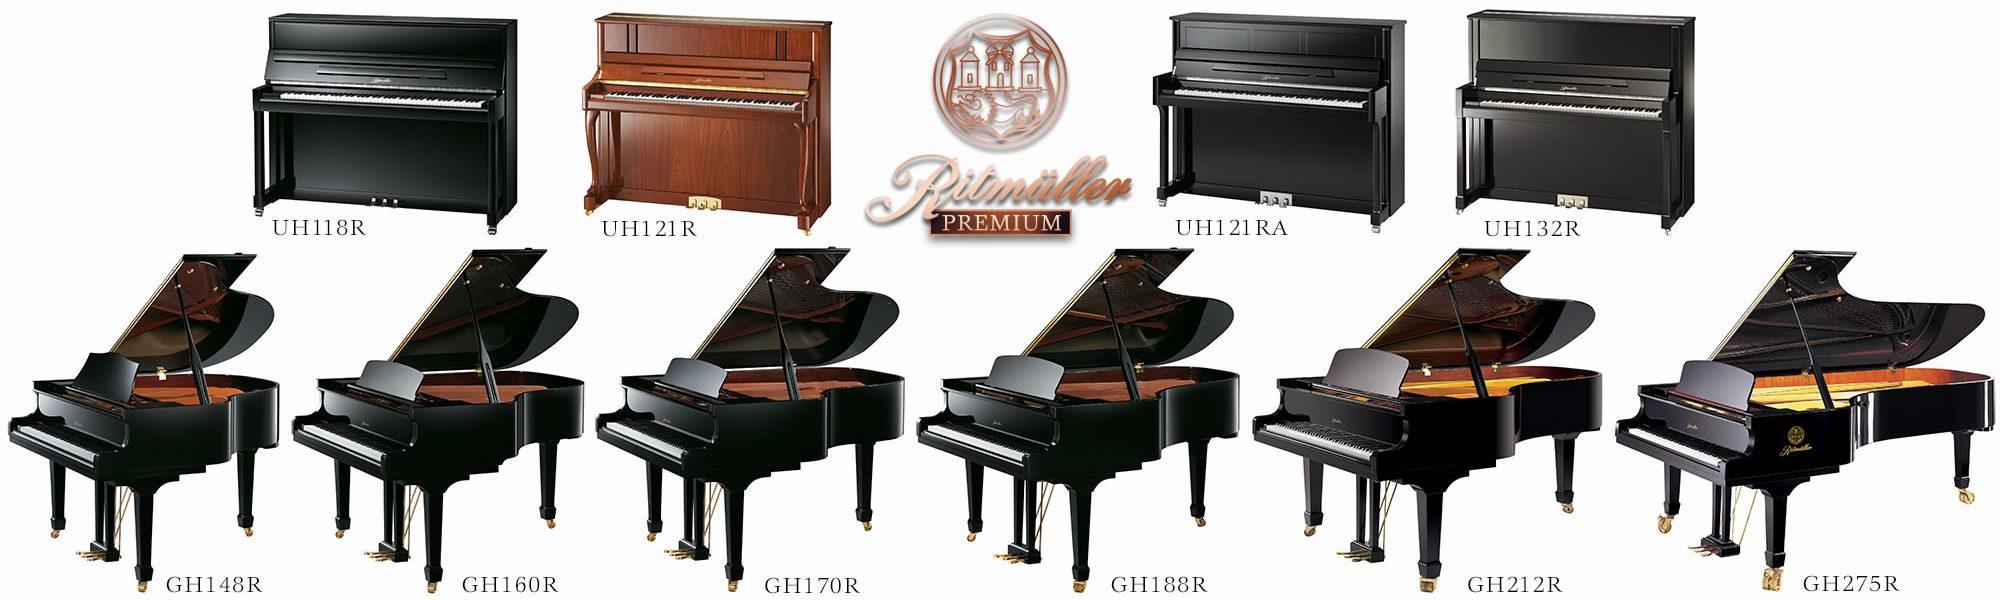 Ritmuller Premium Hi-Res Piano photos